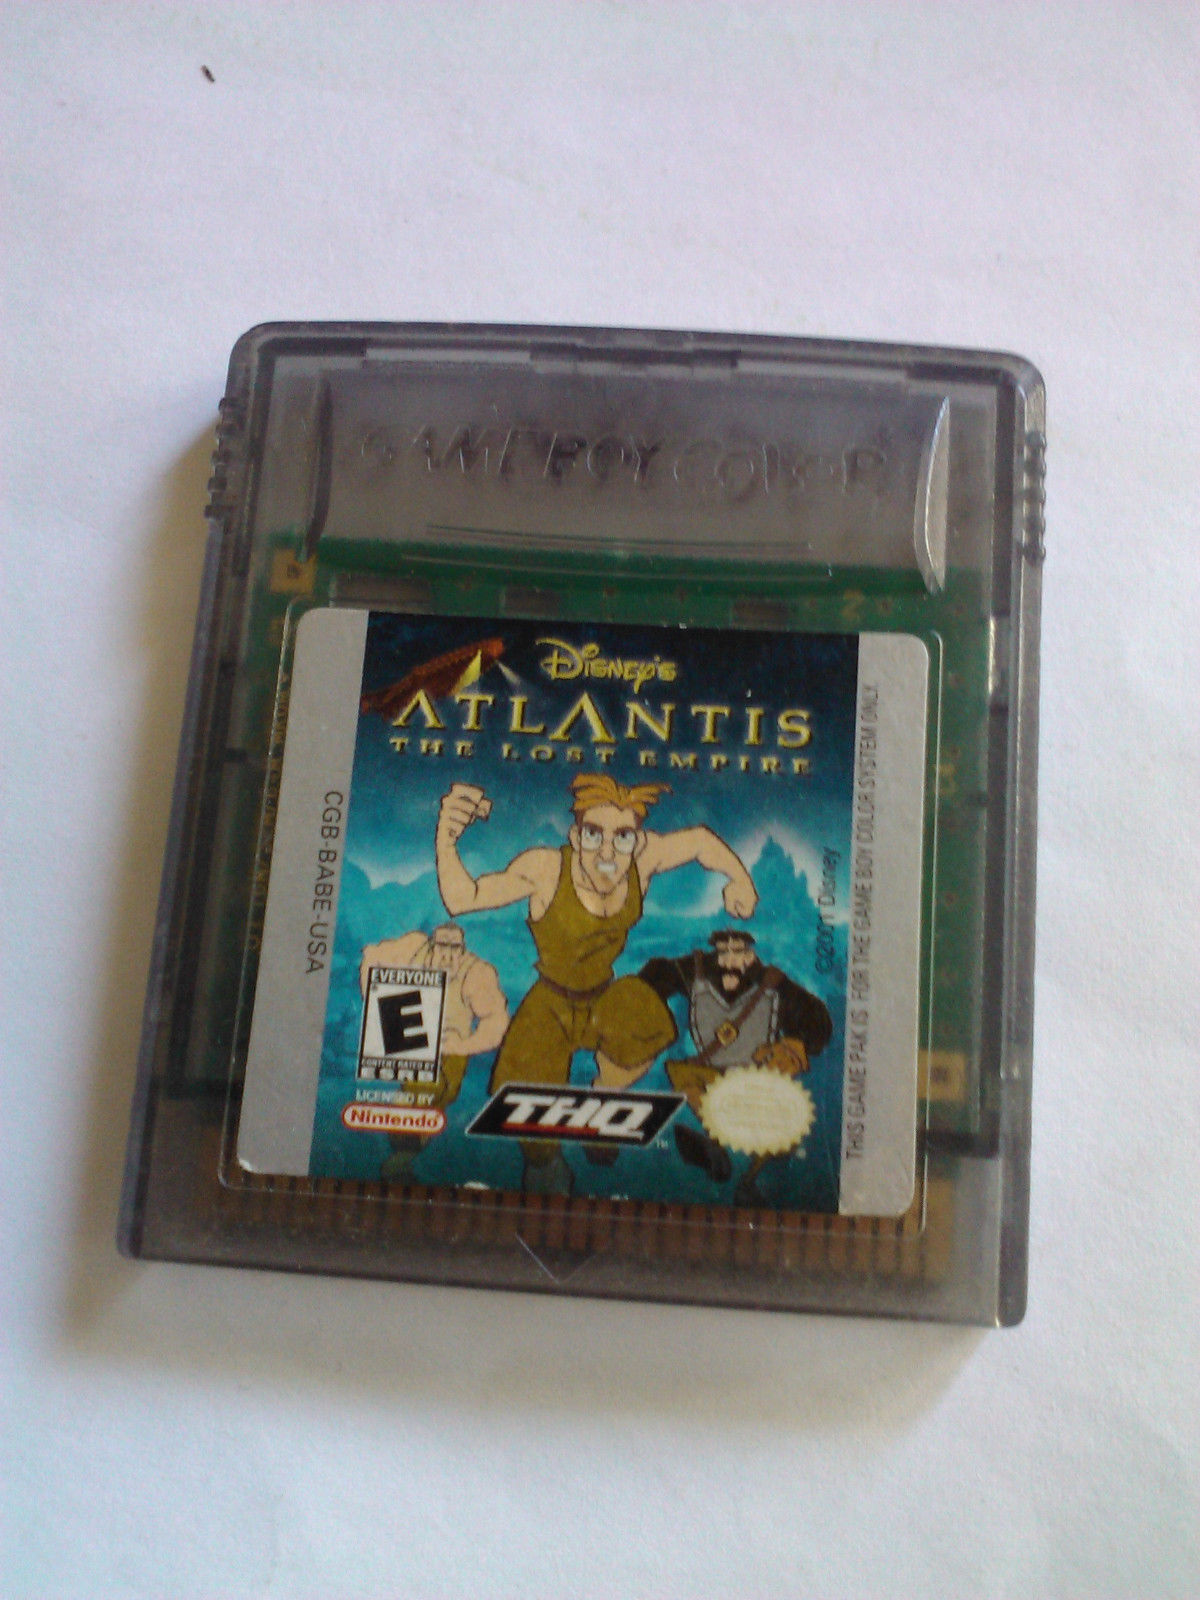 Choose 1 Game Boy Color Games Cartridges : BUGS BUNNY CRAZY CASTLE / BUGS BUNNY  - $5.86